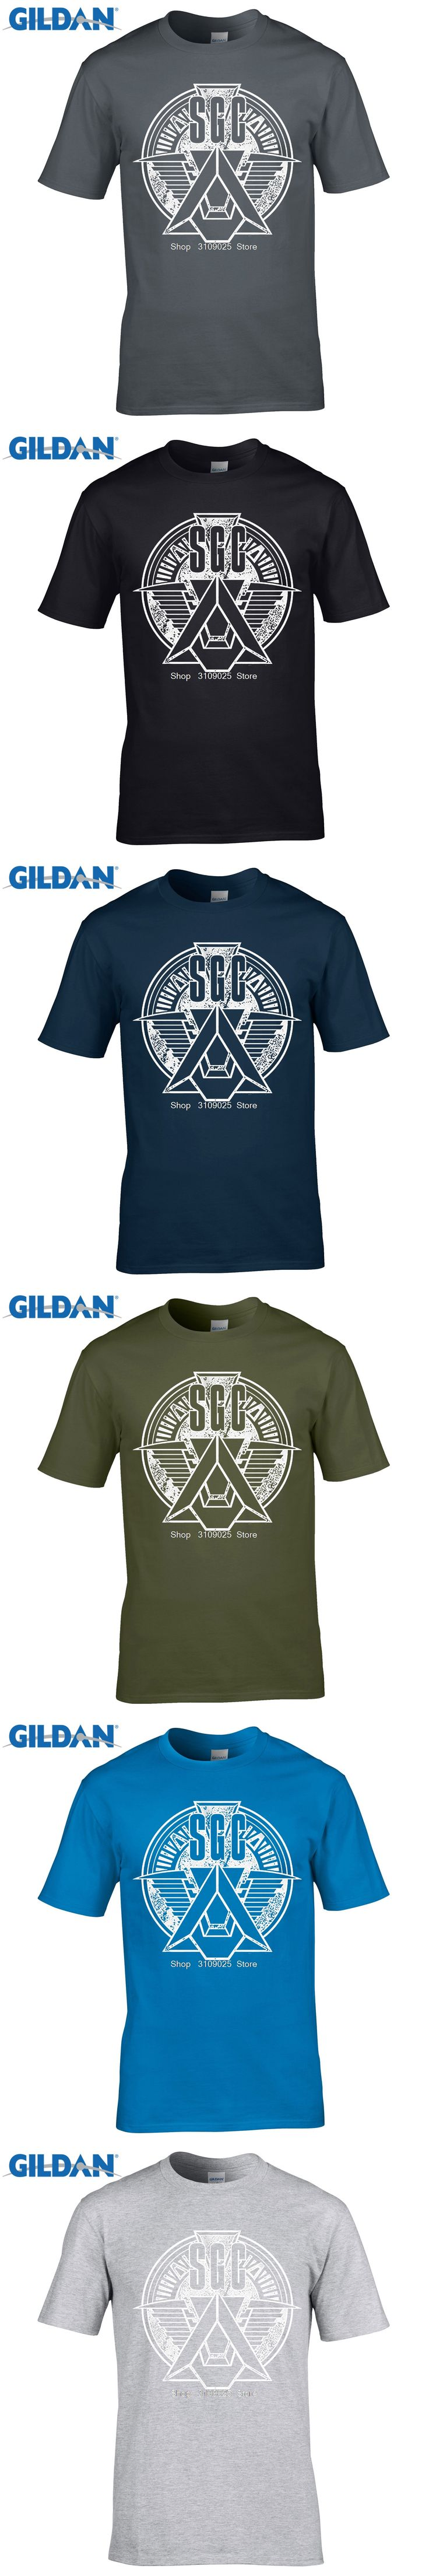 GILDAN 2017 Sale Promotion Fashion Broadcloth Cotton Tee Custom T Shirts Cheap Short Stargate Military Men Printing O-neck Shirt